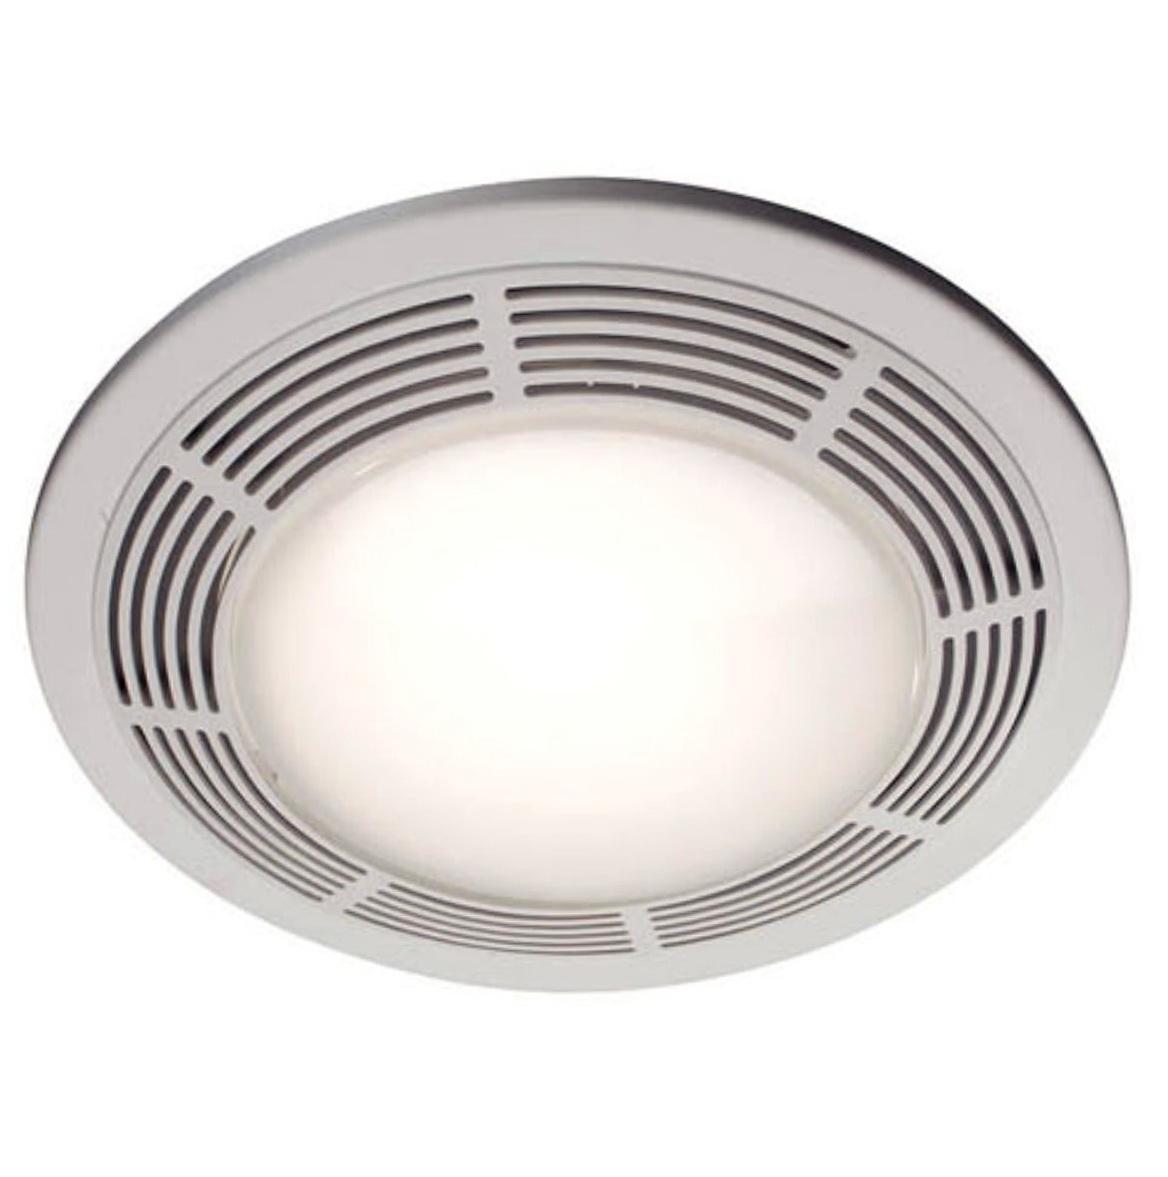 Nutone Bathroom Fan With Light